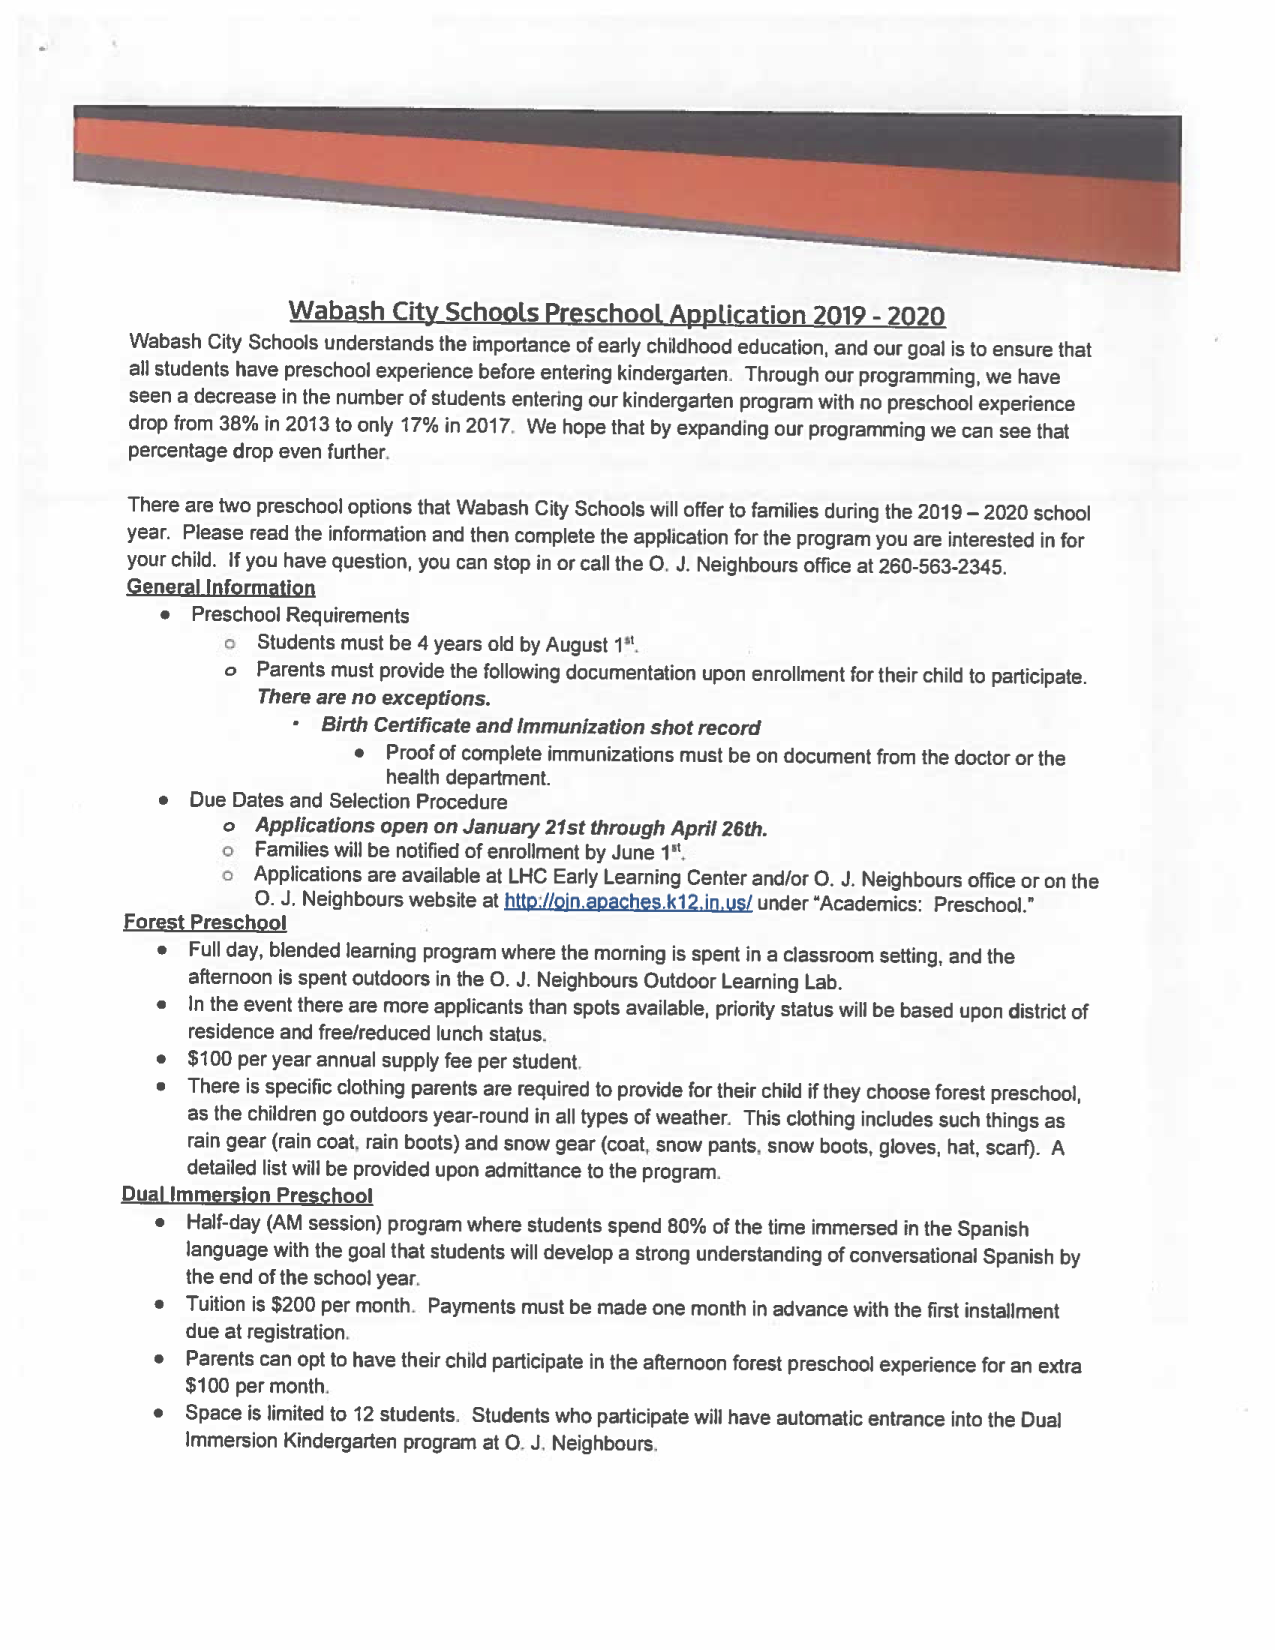 2019-2020 Preschool Application Page 1